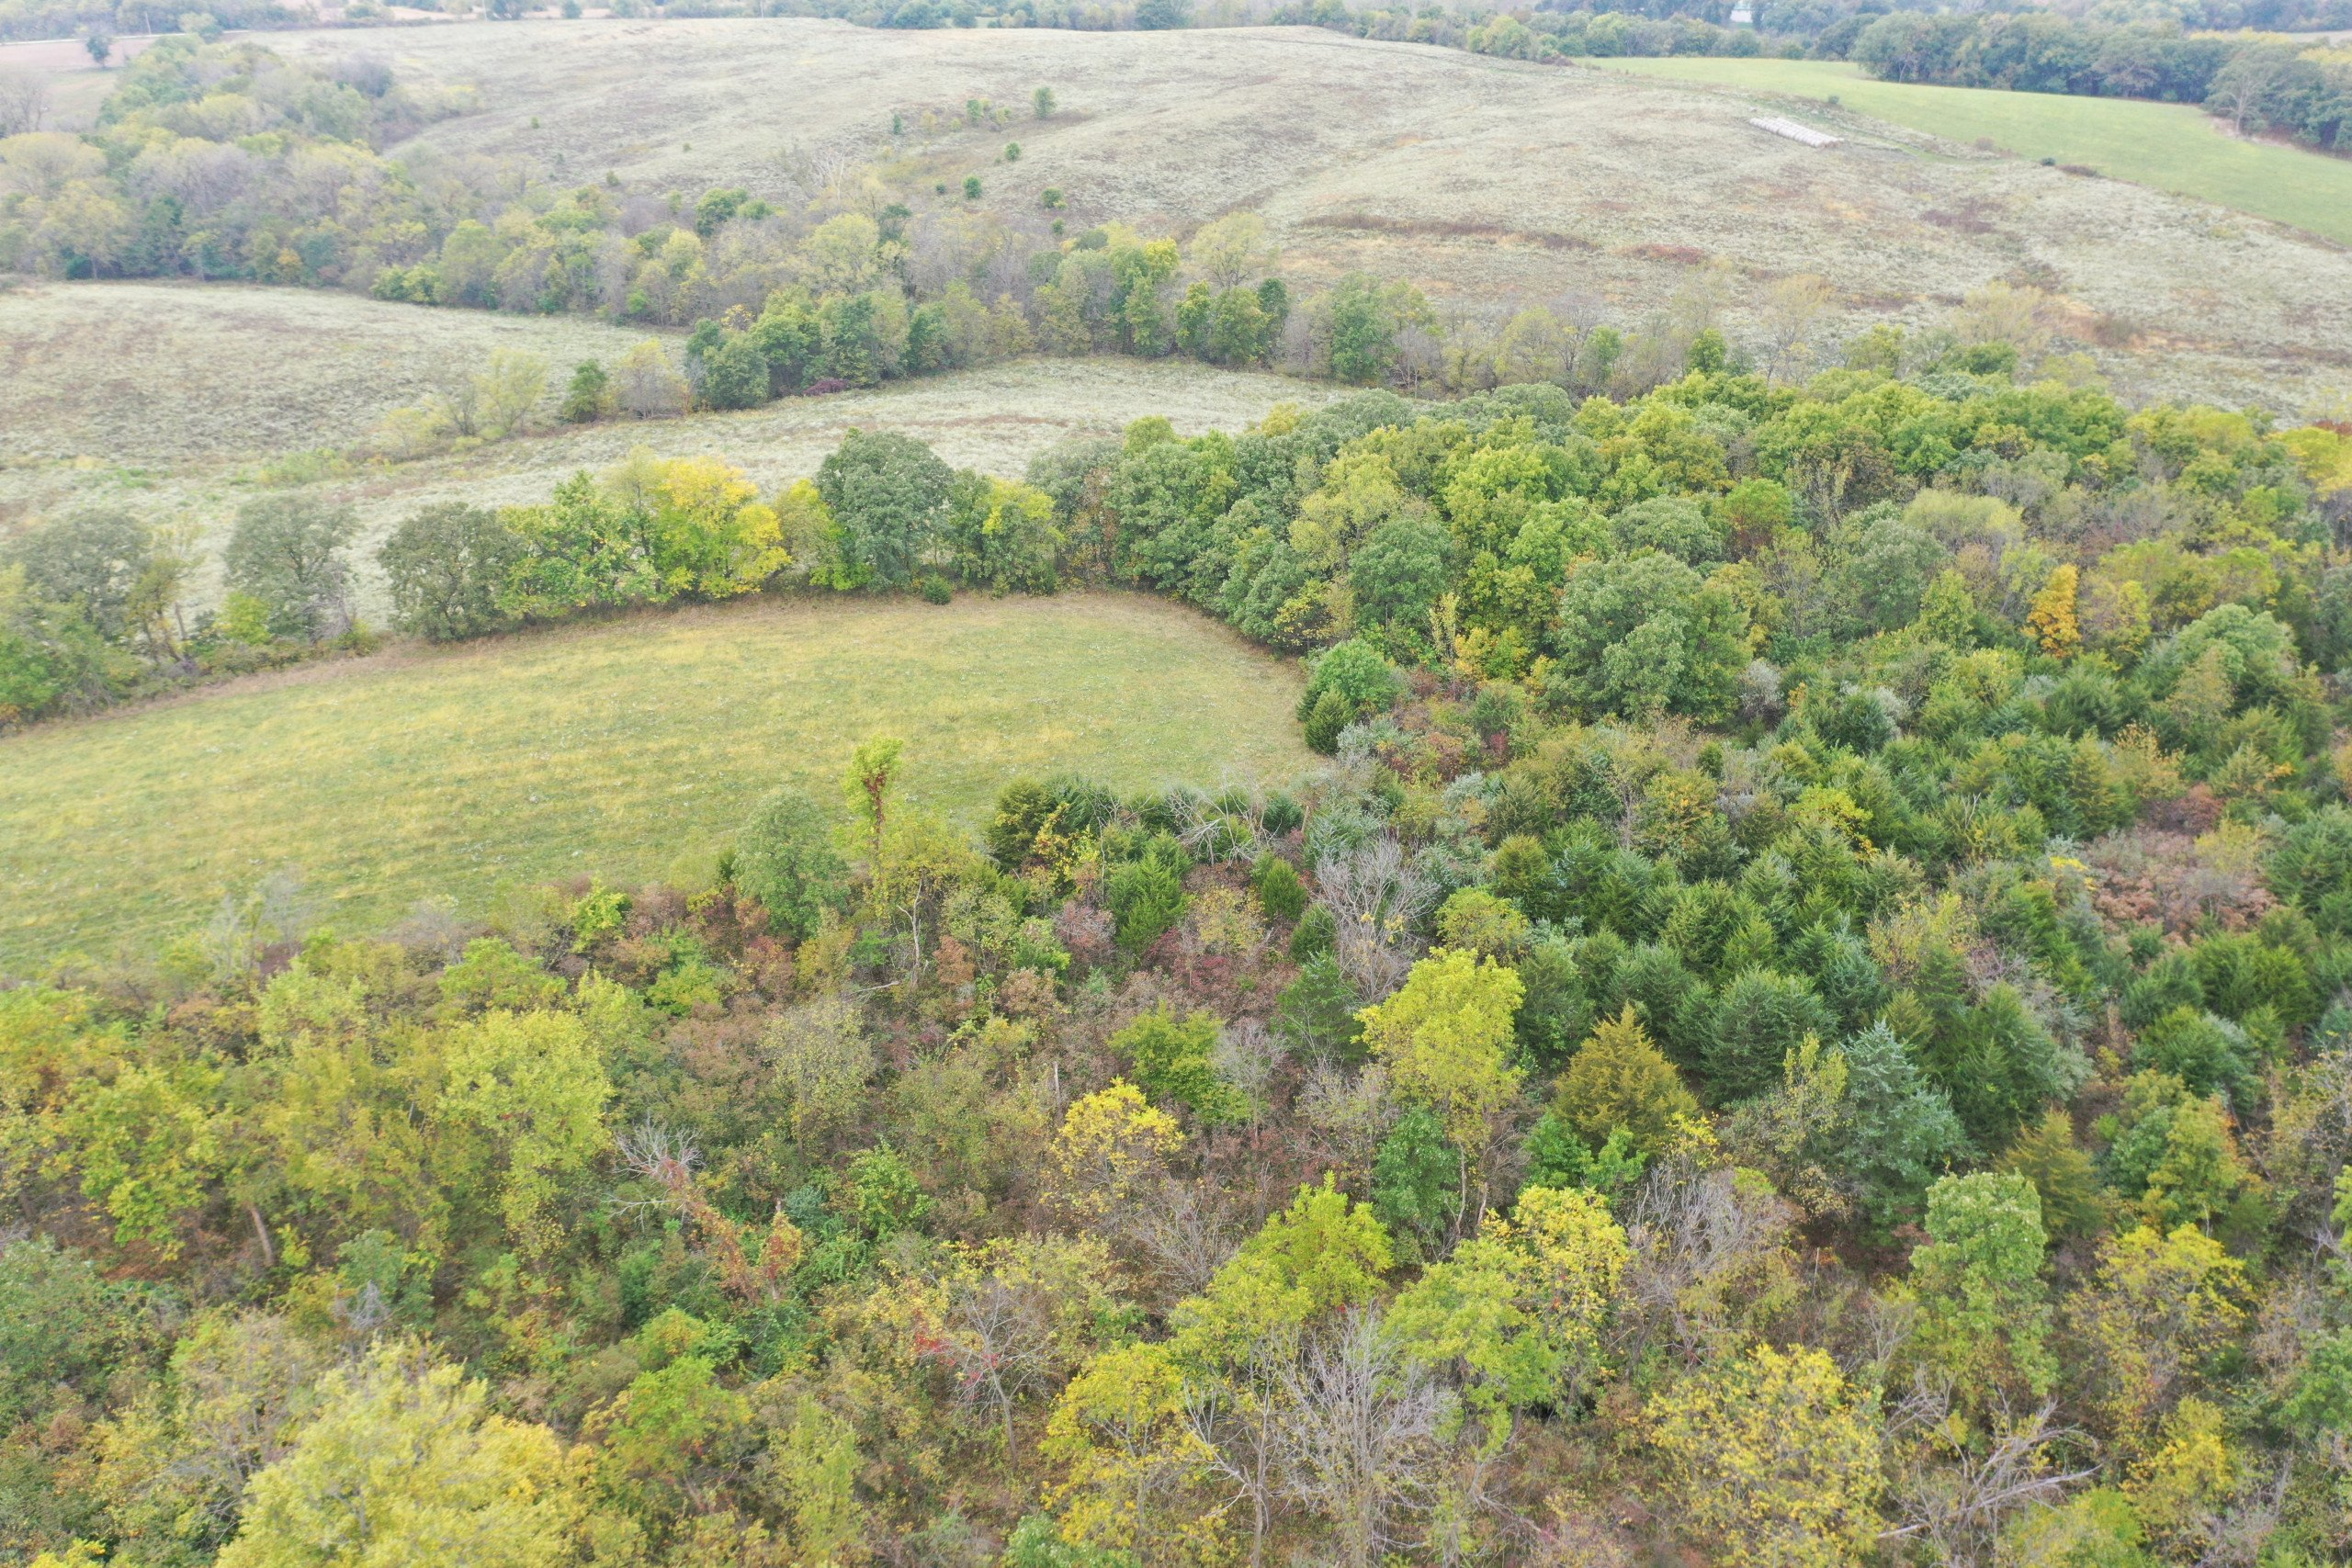 land-warren-county-iowa-200-acres-listing-number-15810-DJI_0602-0.jpg